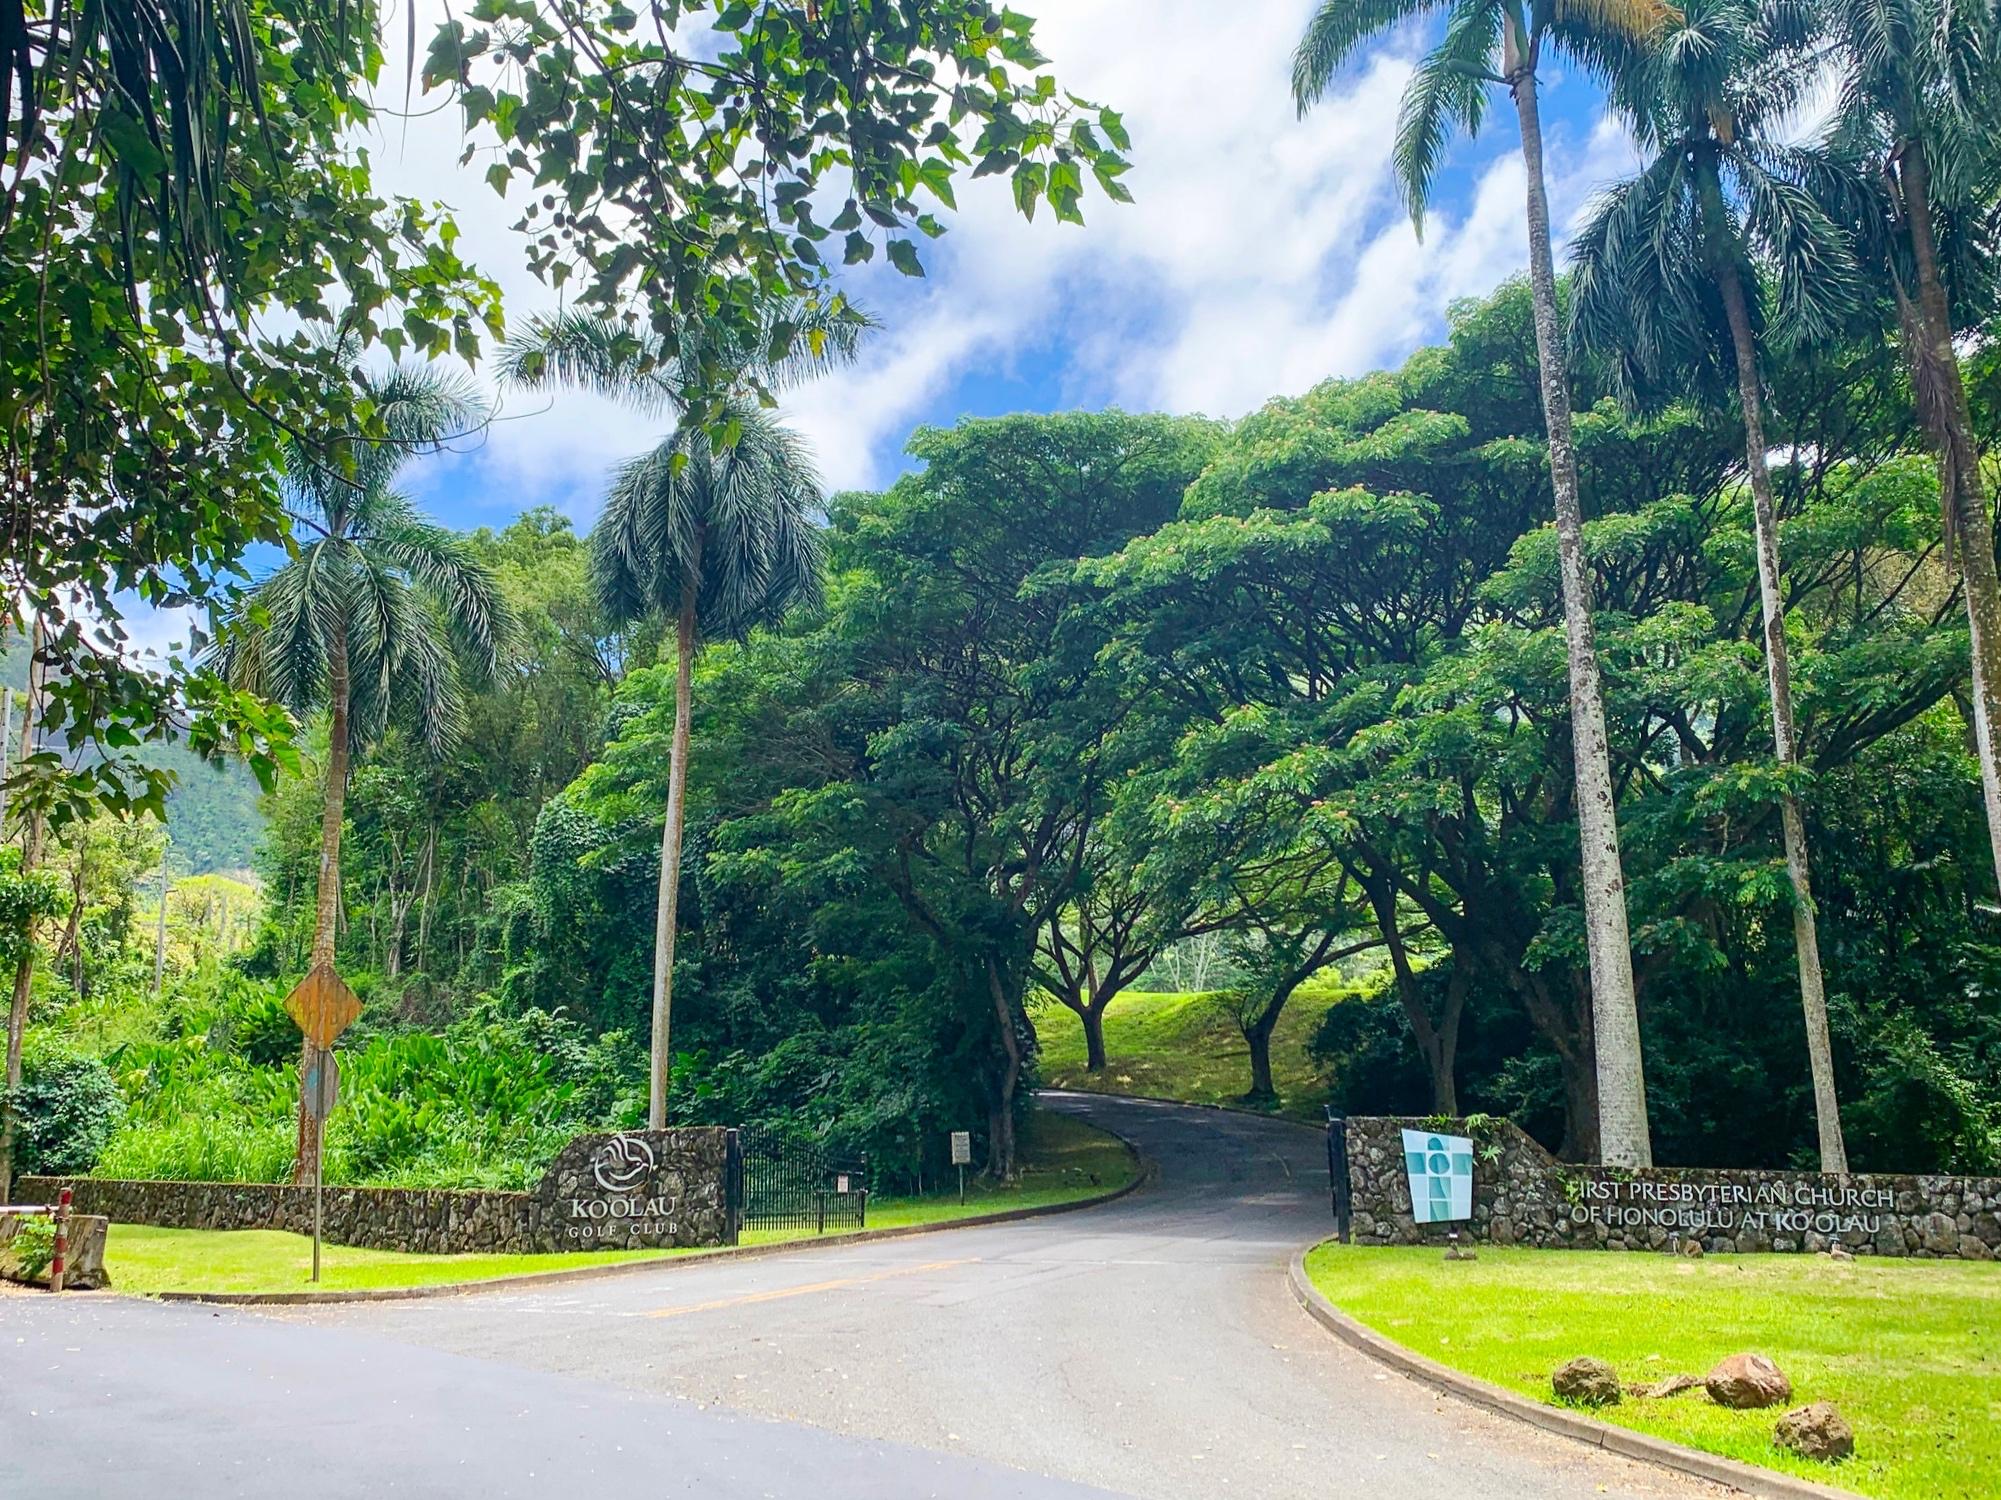 Getting Here - First prez honolulu45-550 Kionaole RoadKaneohe, Hawaii 96744808.532.1111SHUTTLE VAN SCHEDULE➝